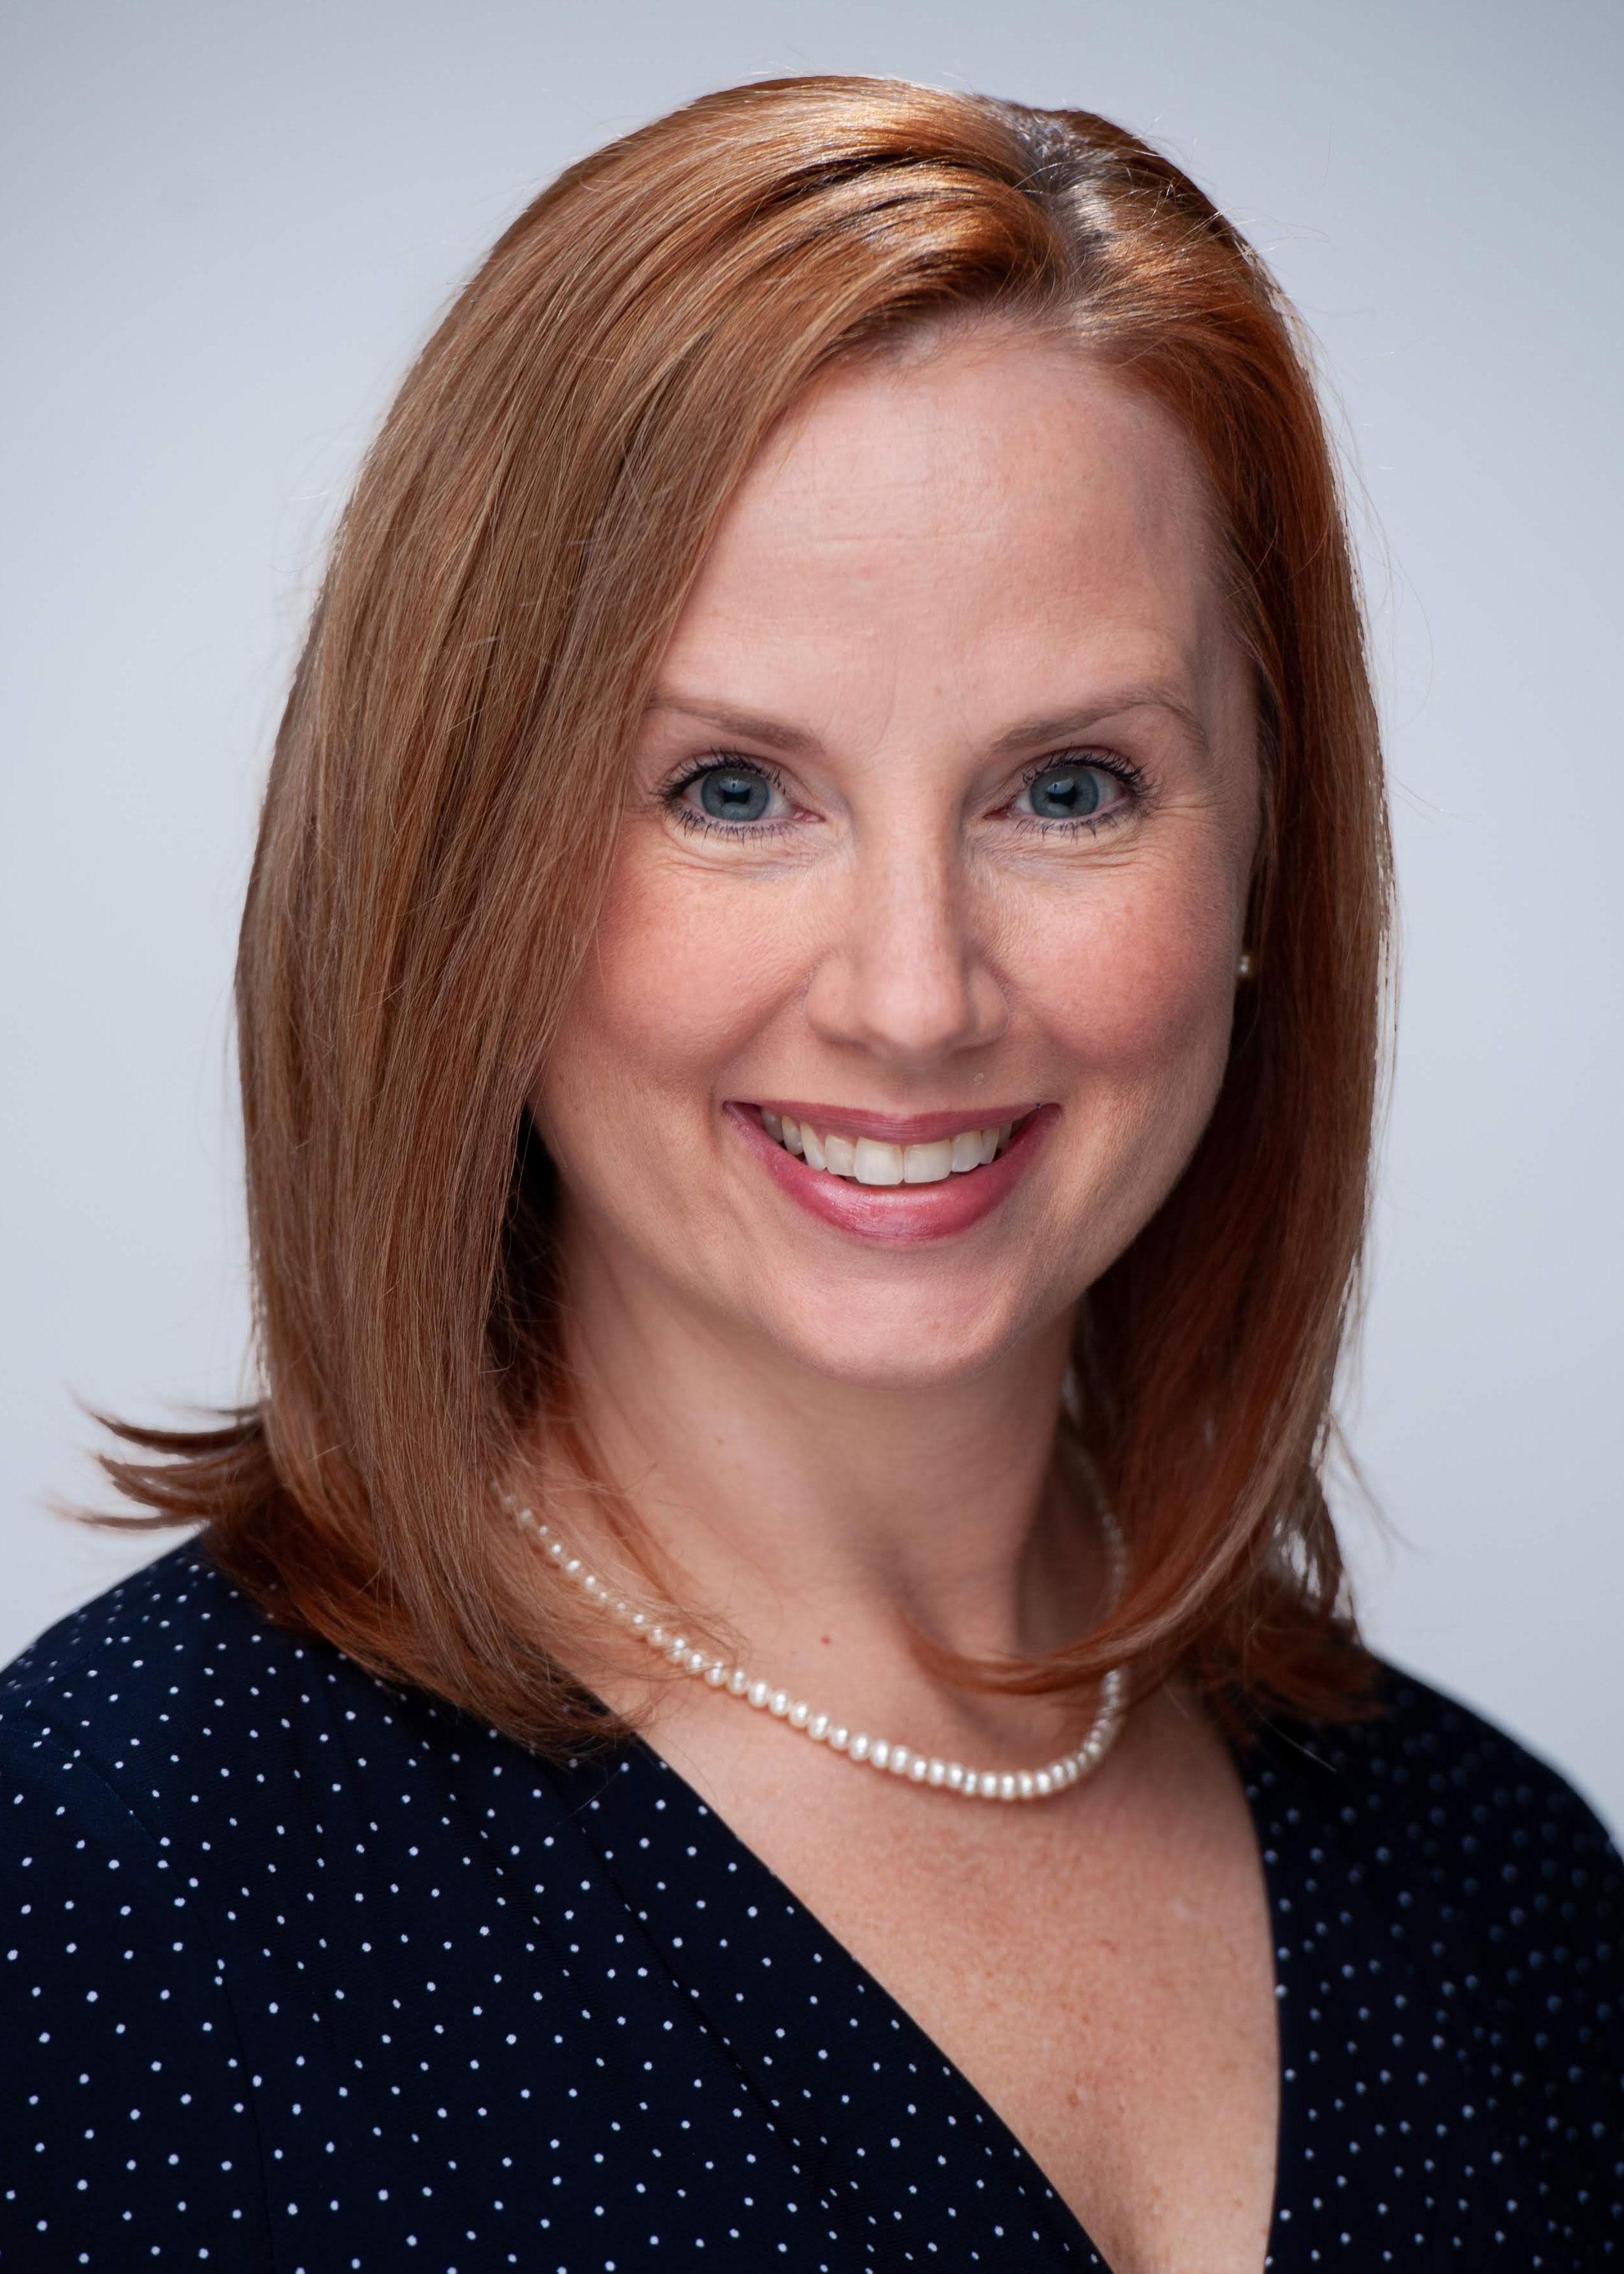 Melissa Frain